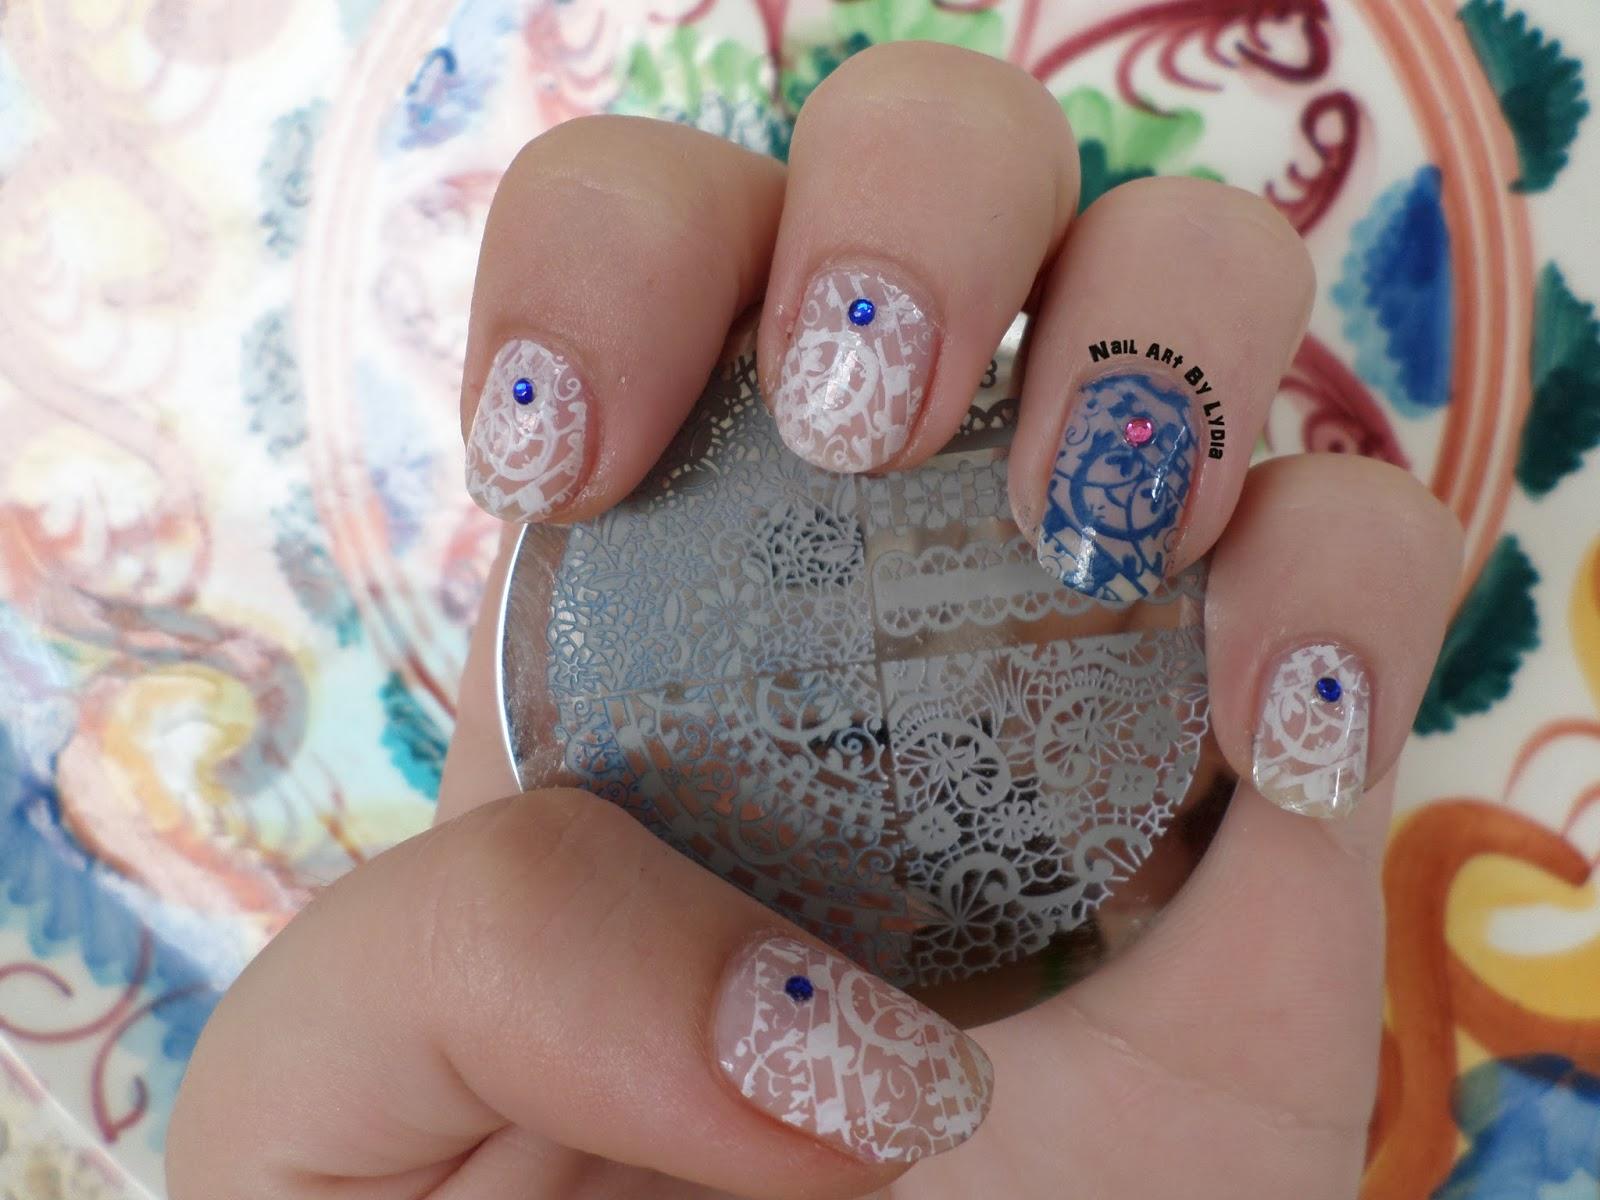 Nail Art By Lydia: Encaje azul y blanco